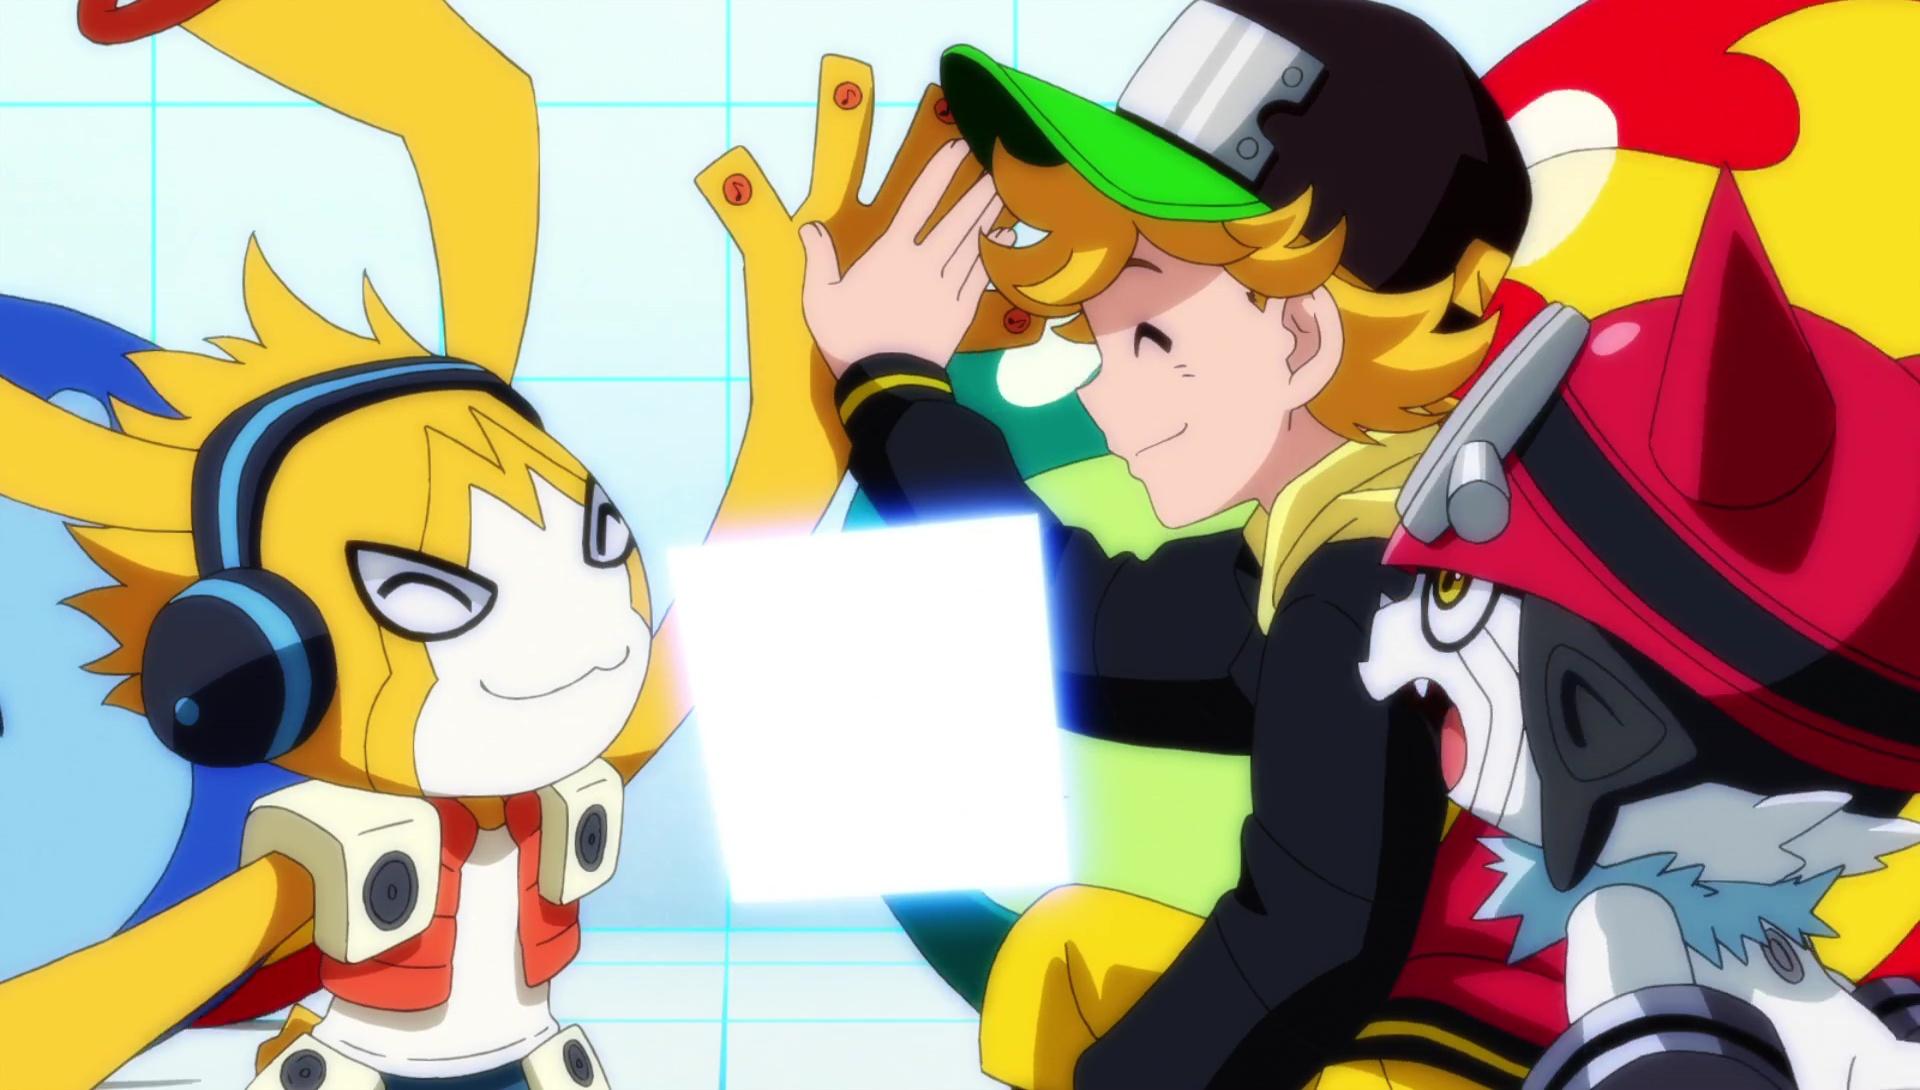 [VOSTFR] Digimon Universe Appli Monsters : Episode 14